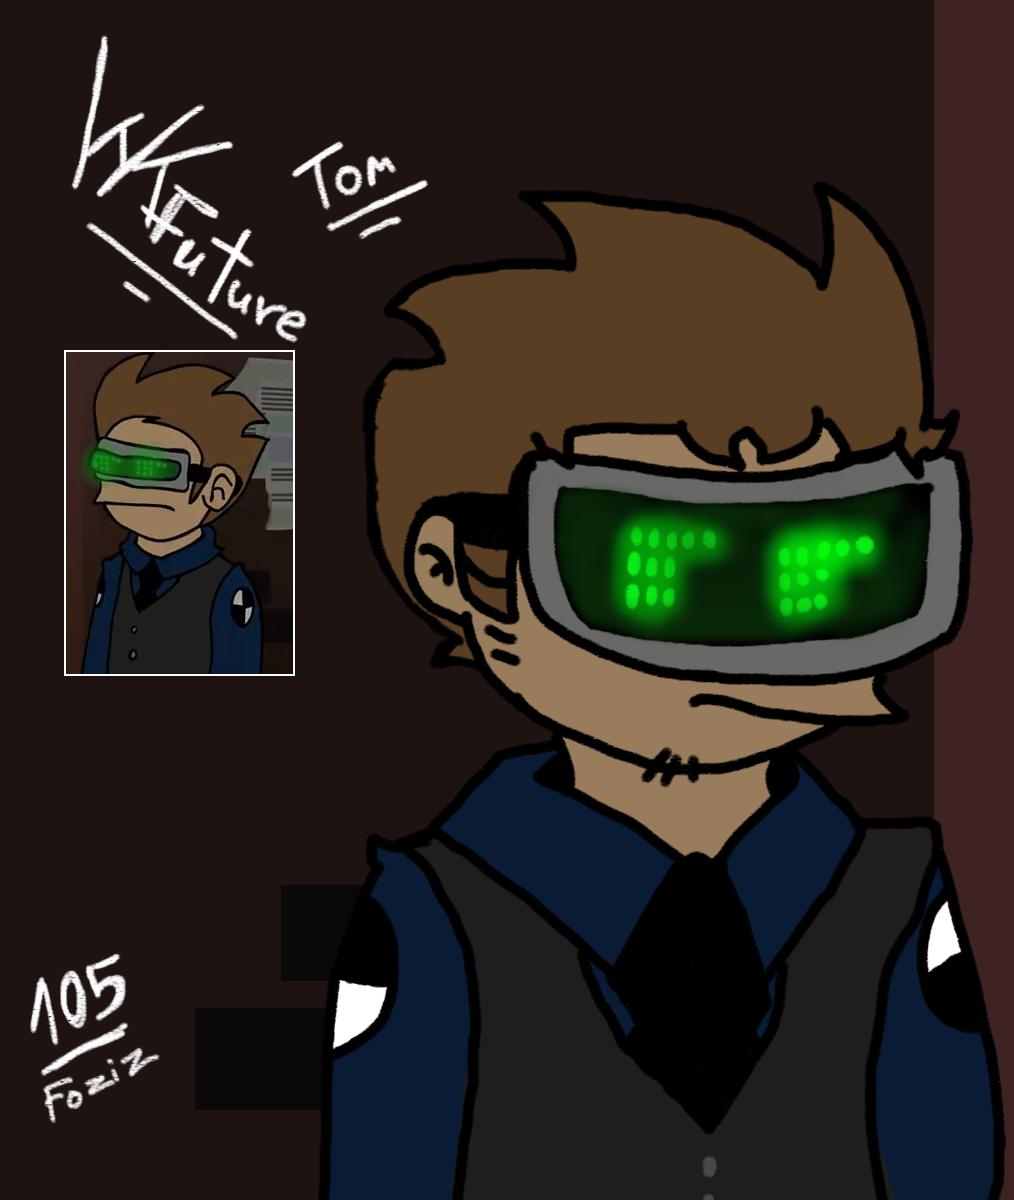 WTFuture Tom [Screenshot Re-draw!] by Foziz105